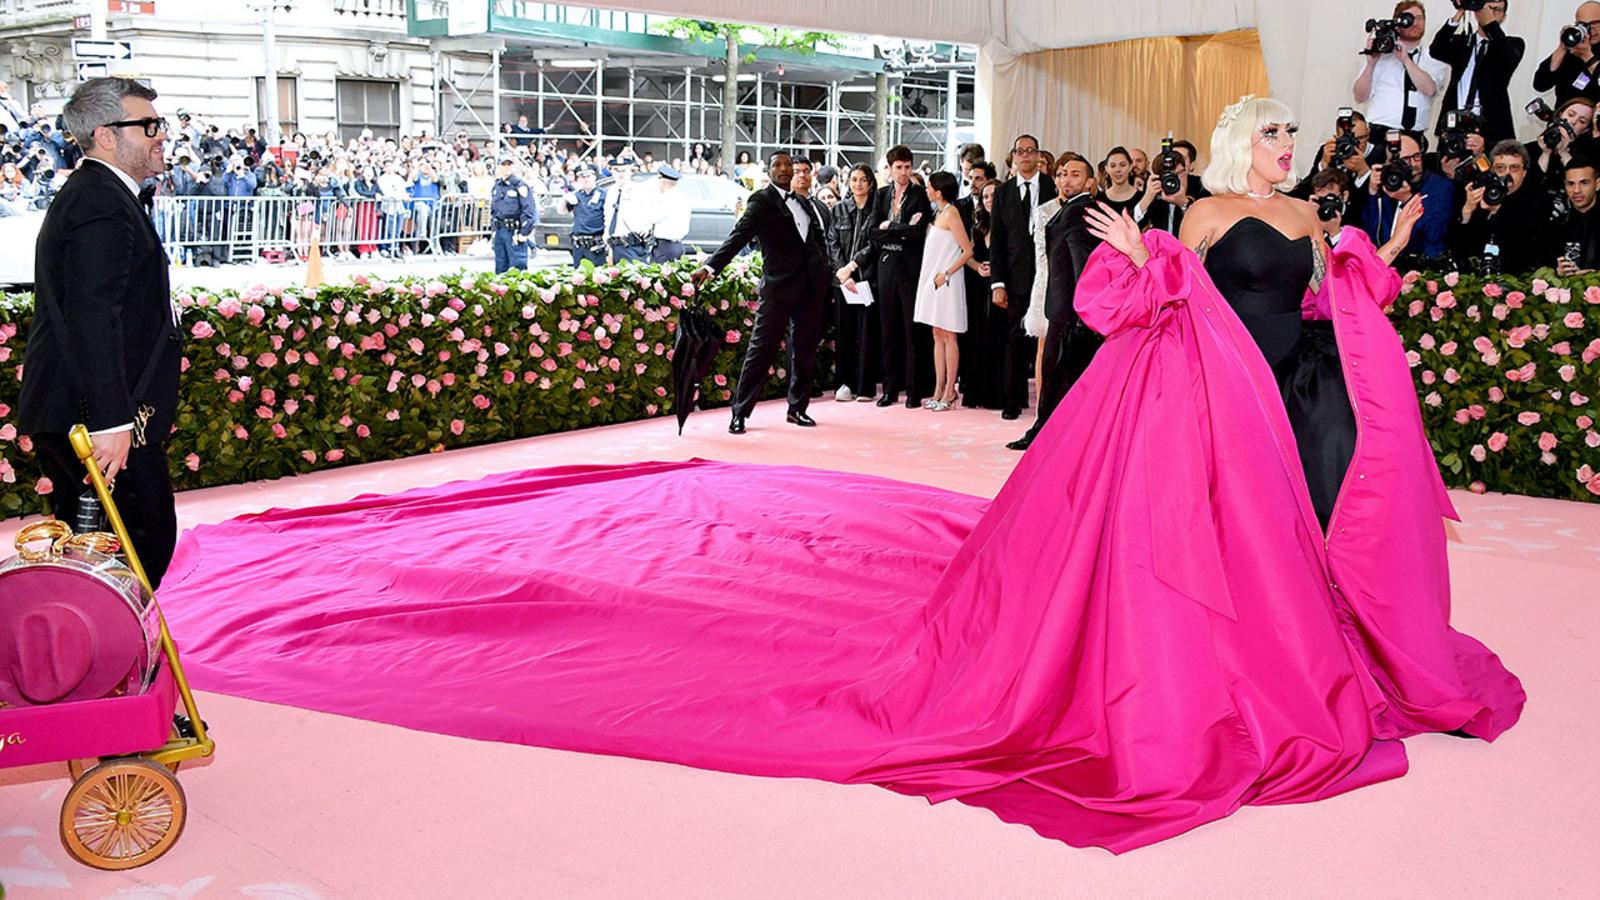 Lady Gaga Met Gala 2019 Dress Includes 3 Fashion Changes